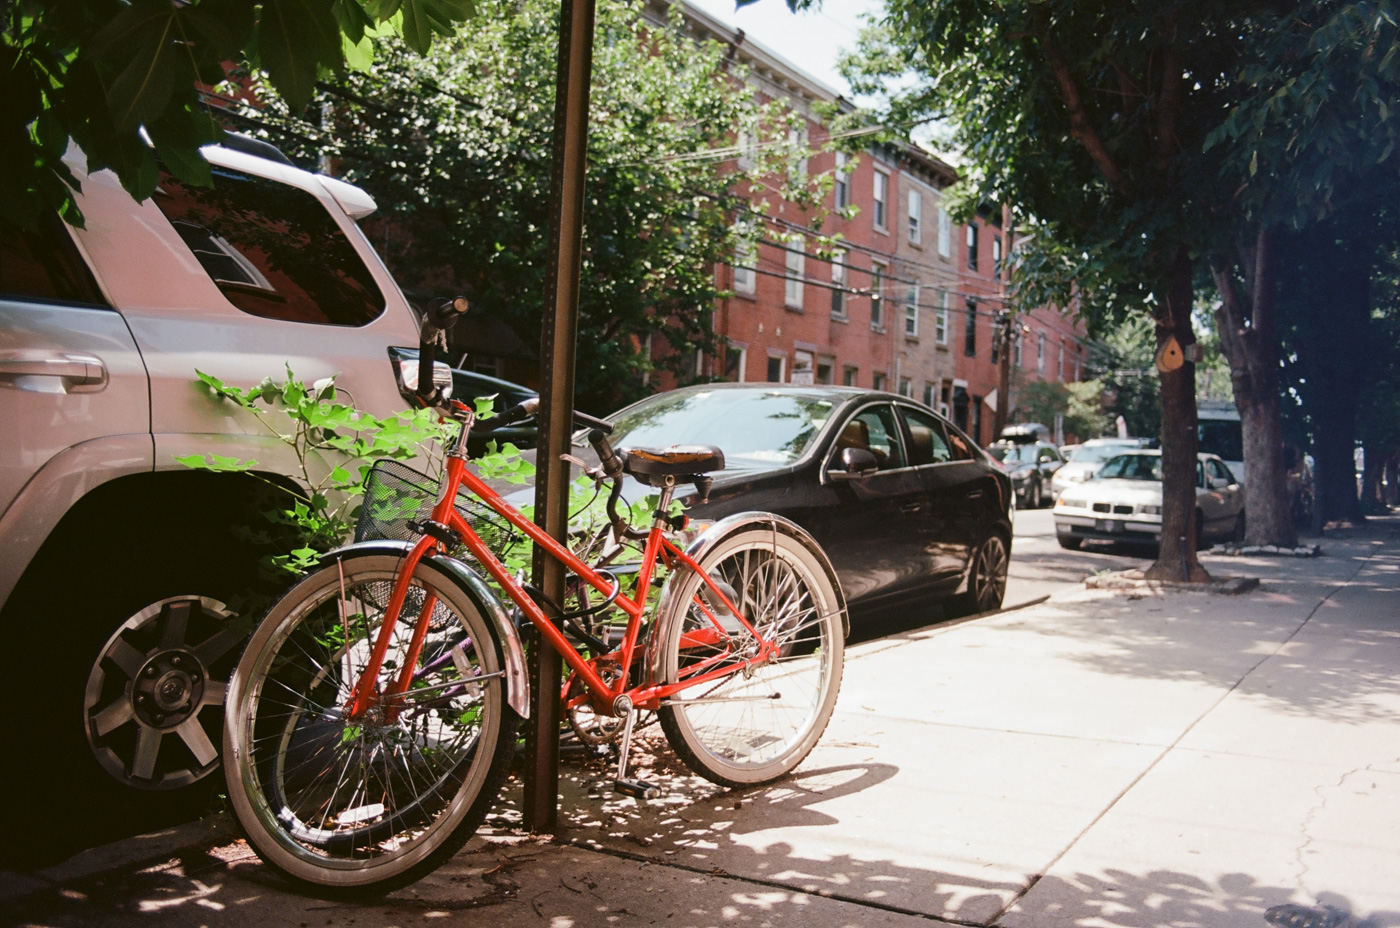 Philly Bikes